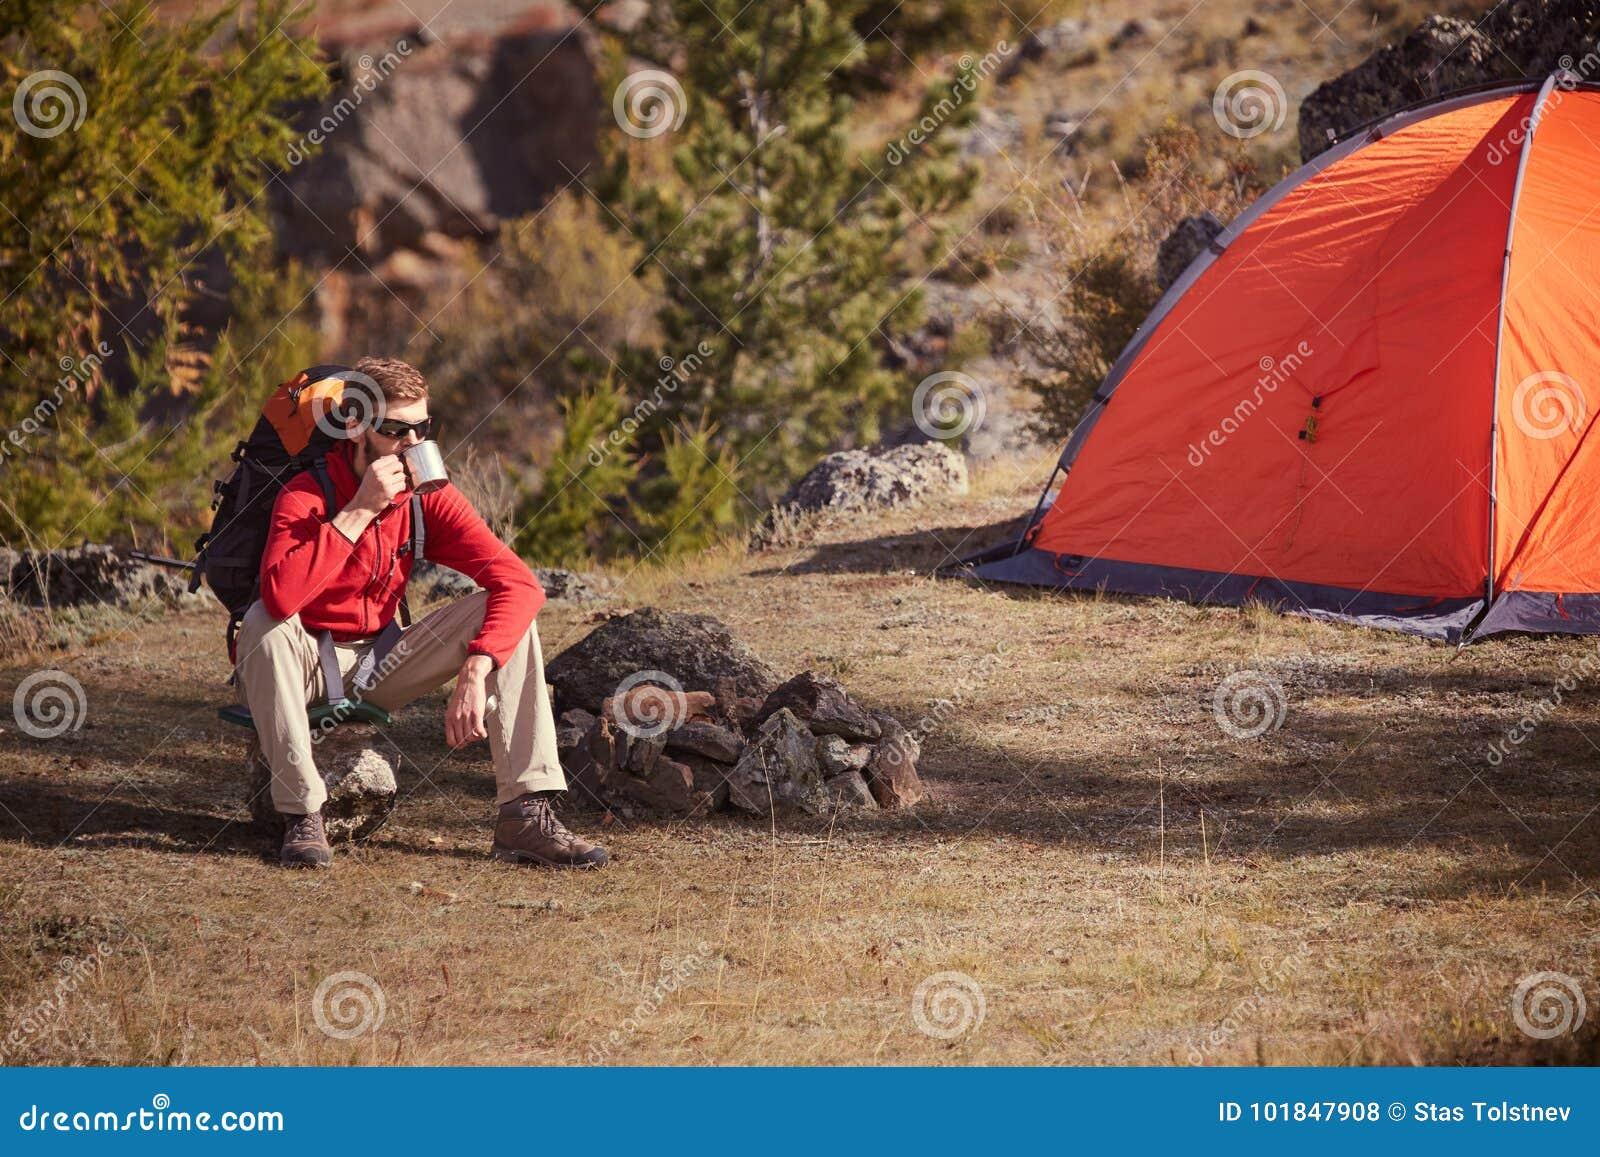 Backpacker Having Rest Near Orange Tent, Drinks Tea From Cup   Stock